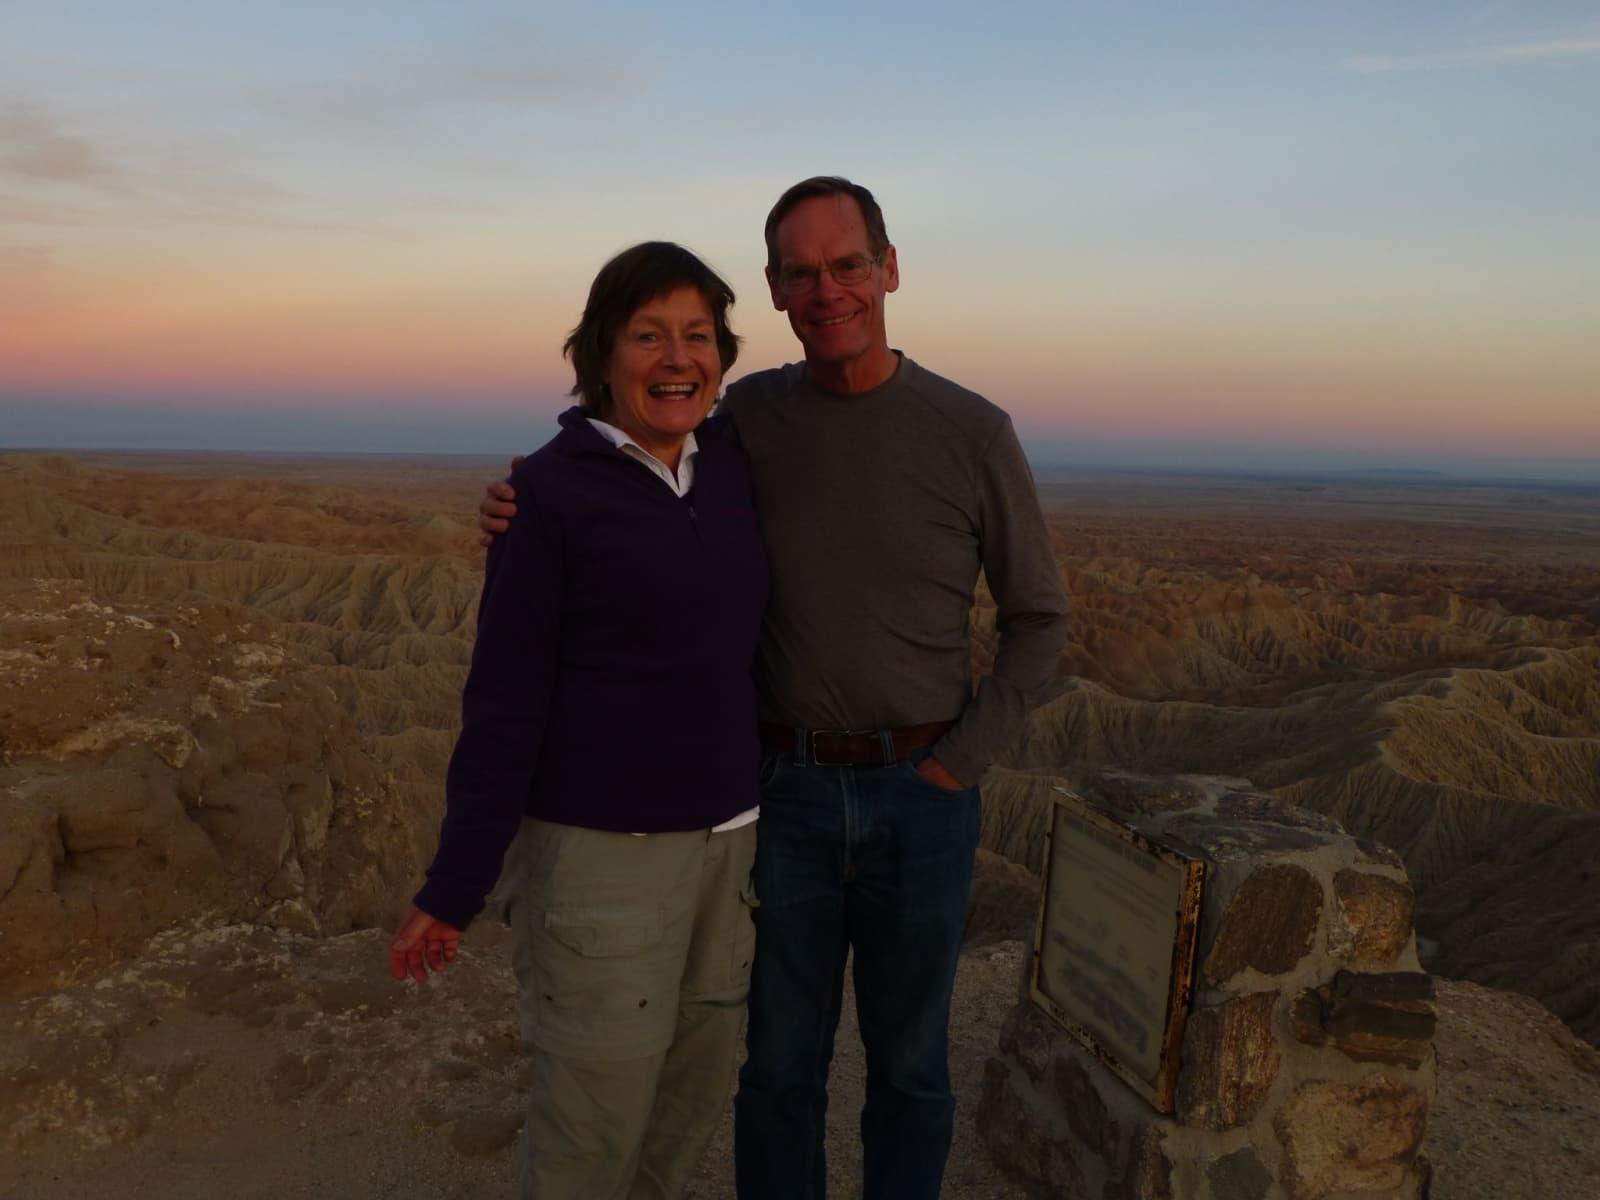 Philip & Barbara from Walla Walla, Washington, United States